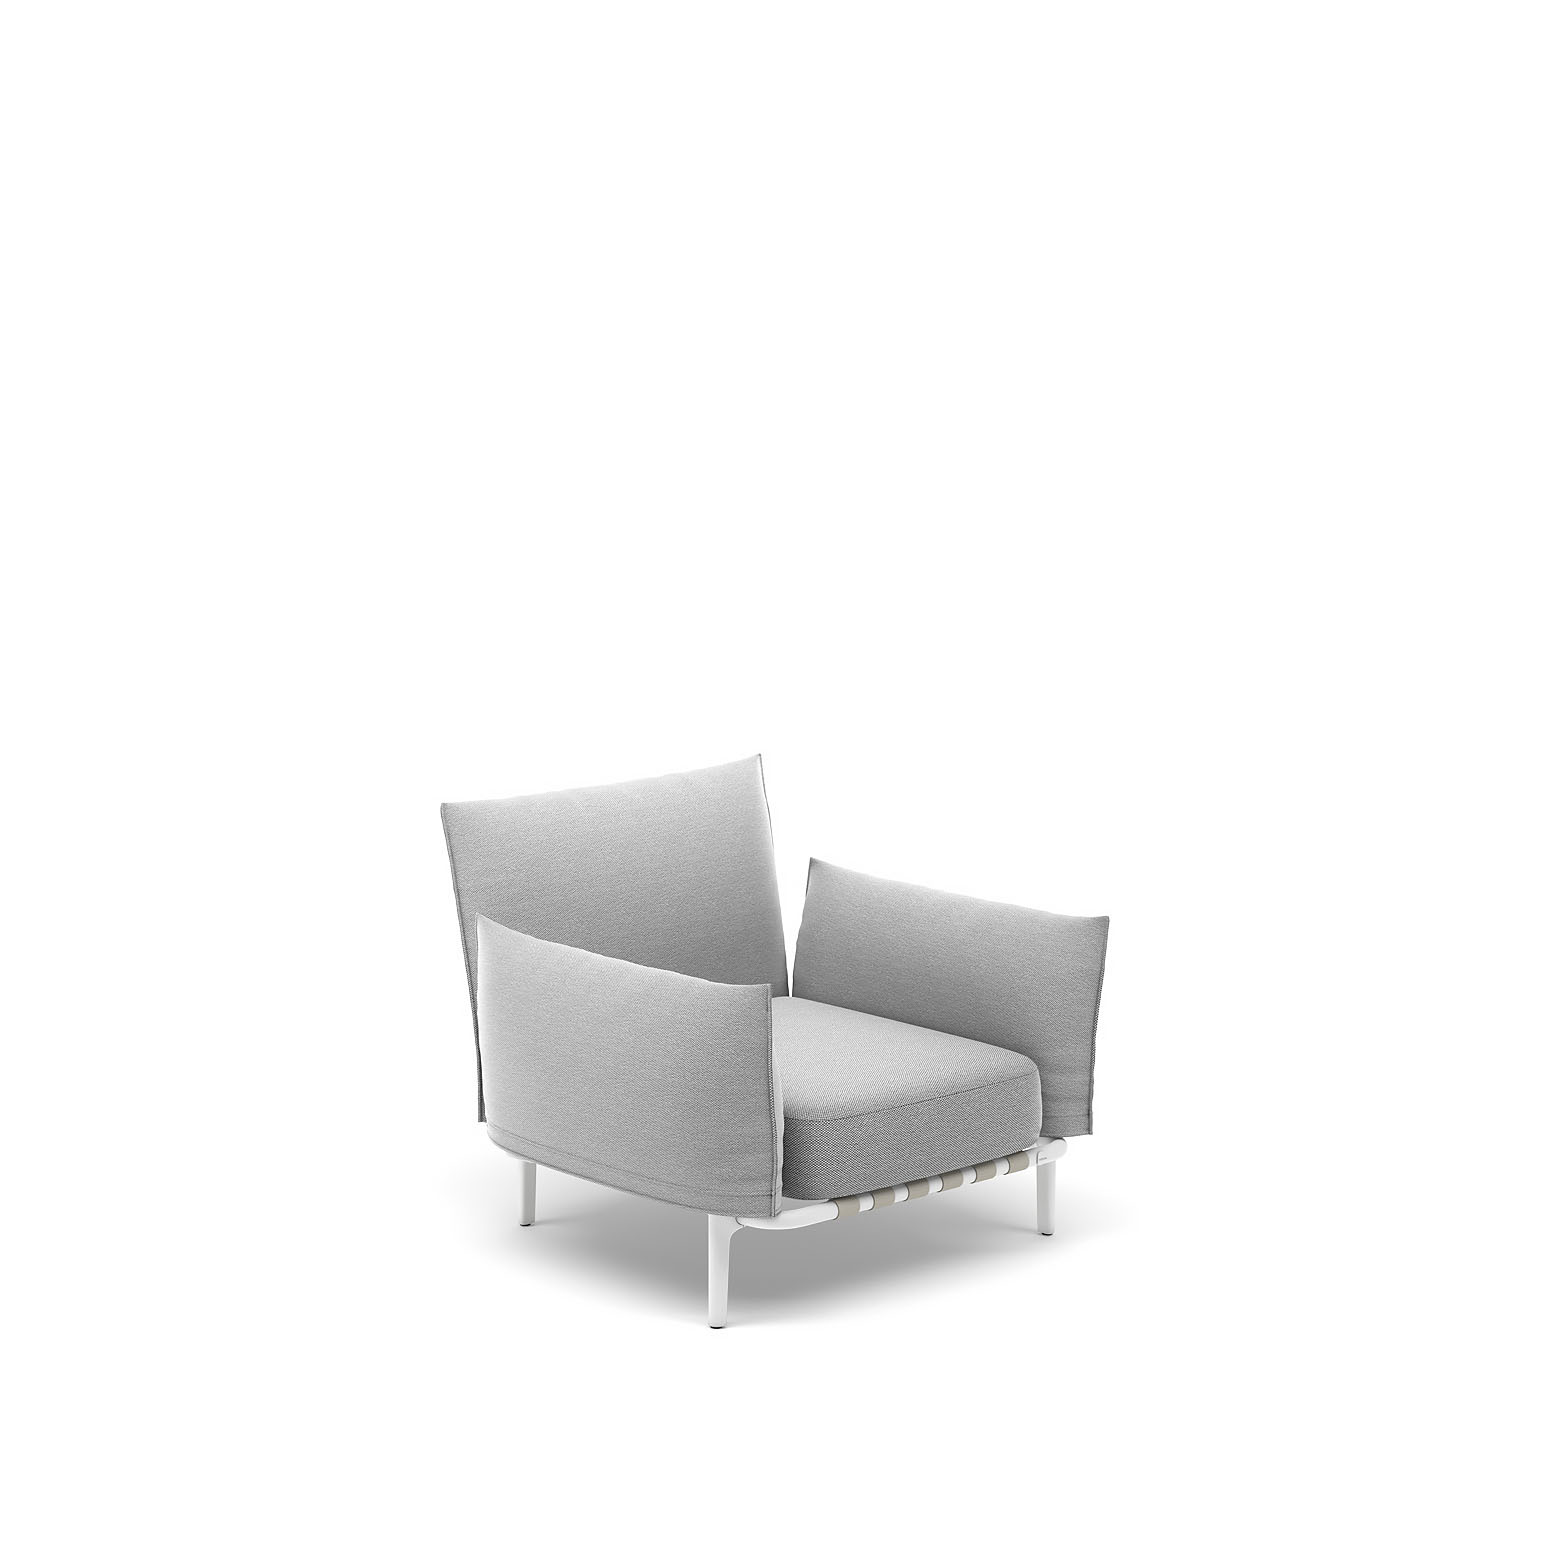 DEDON-BREA-Lounge-chair.jpg